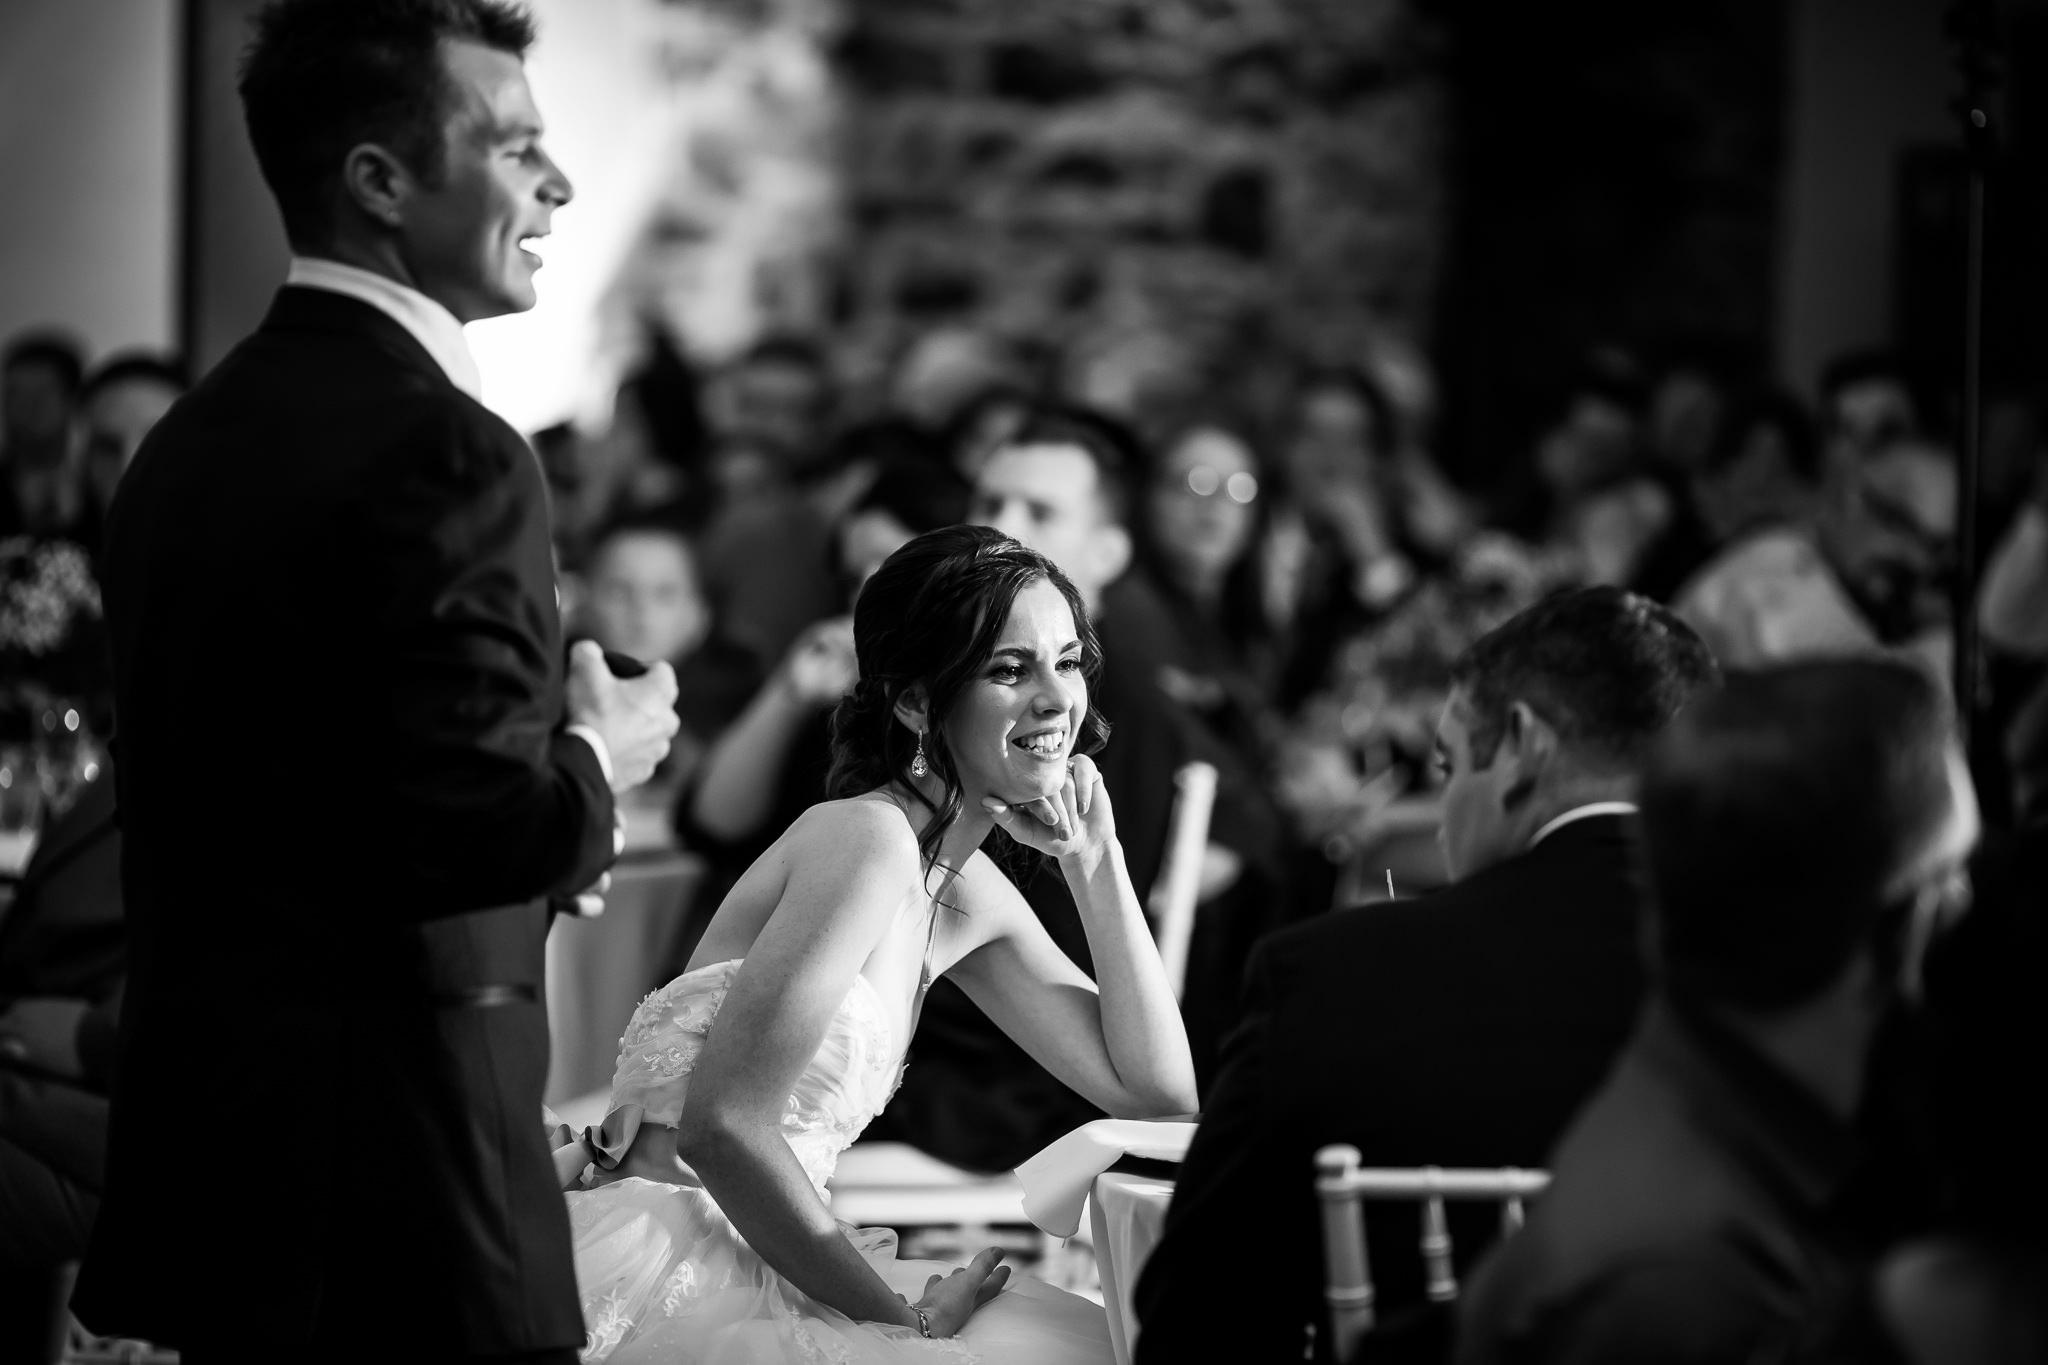 2016-12-10 - Grosso-Stock Wedding-0021.jpg